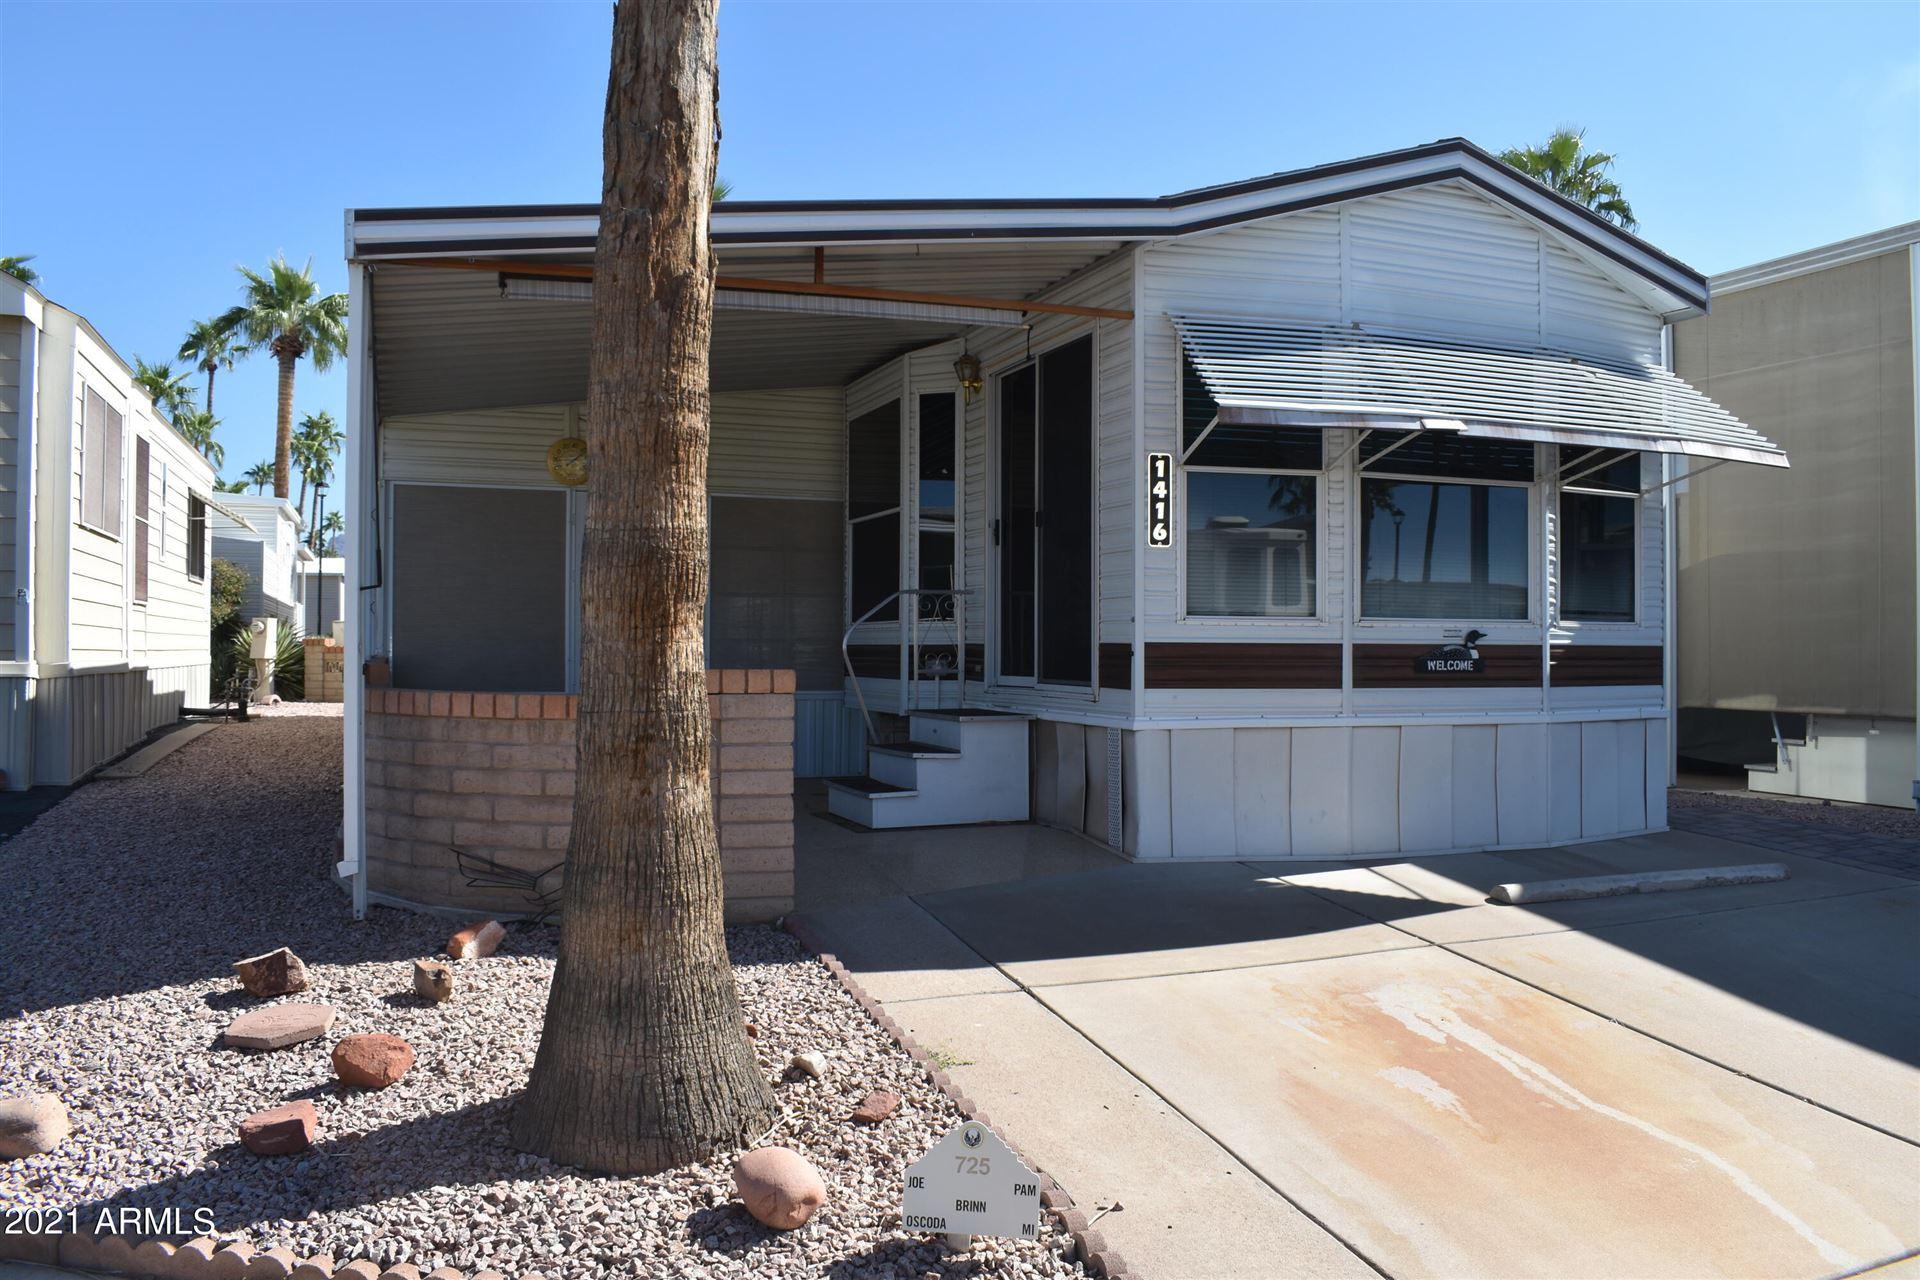 Photo of 1416 S HAVASUPAI Drive, Apache Junction, AZ 85119 (MLS # 6303956)